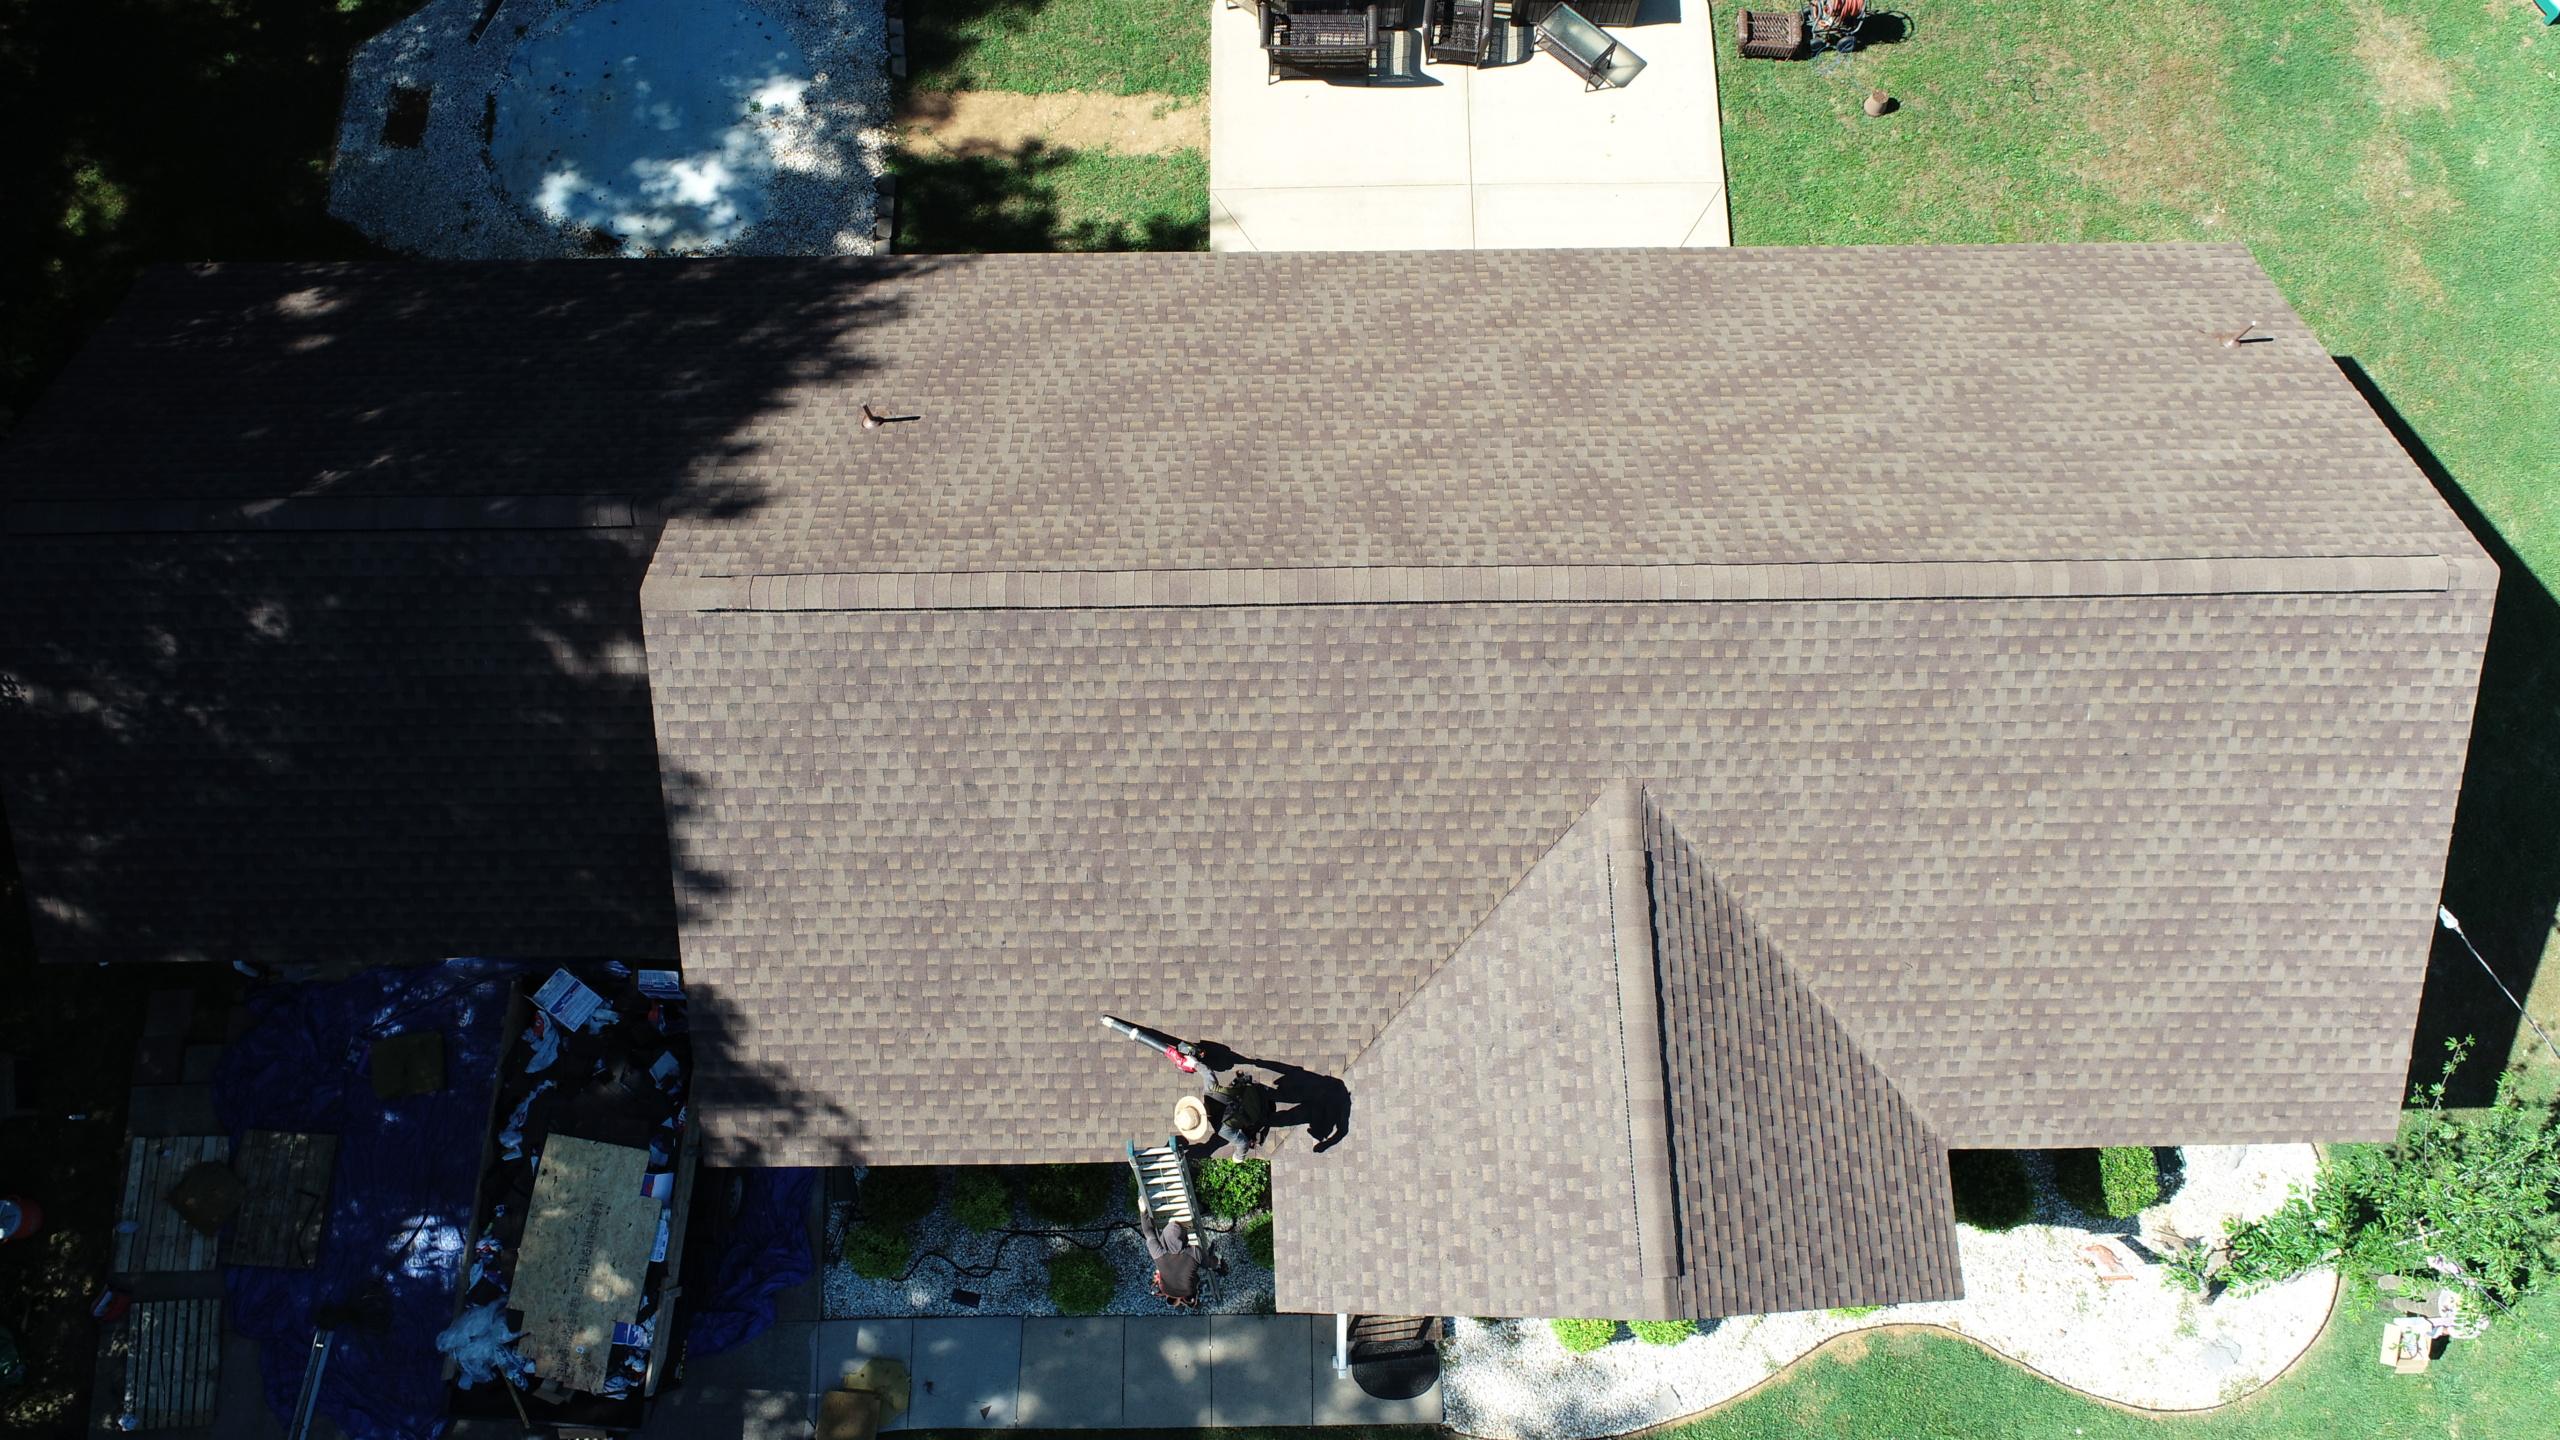 Murfreesboro Roofers GAF Timberline HDZ Barkwood 1